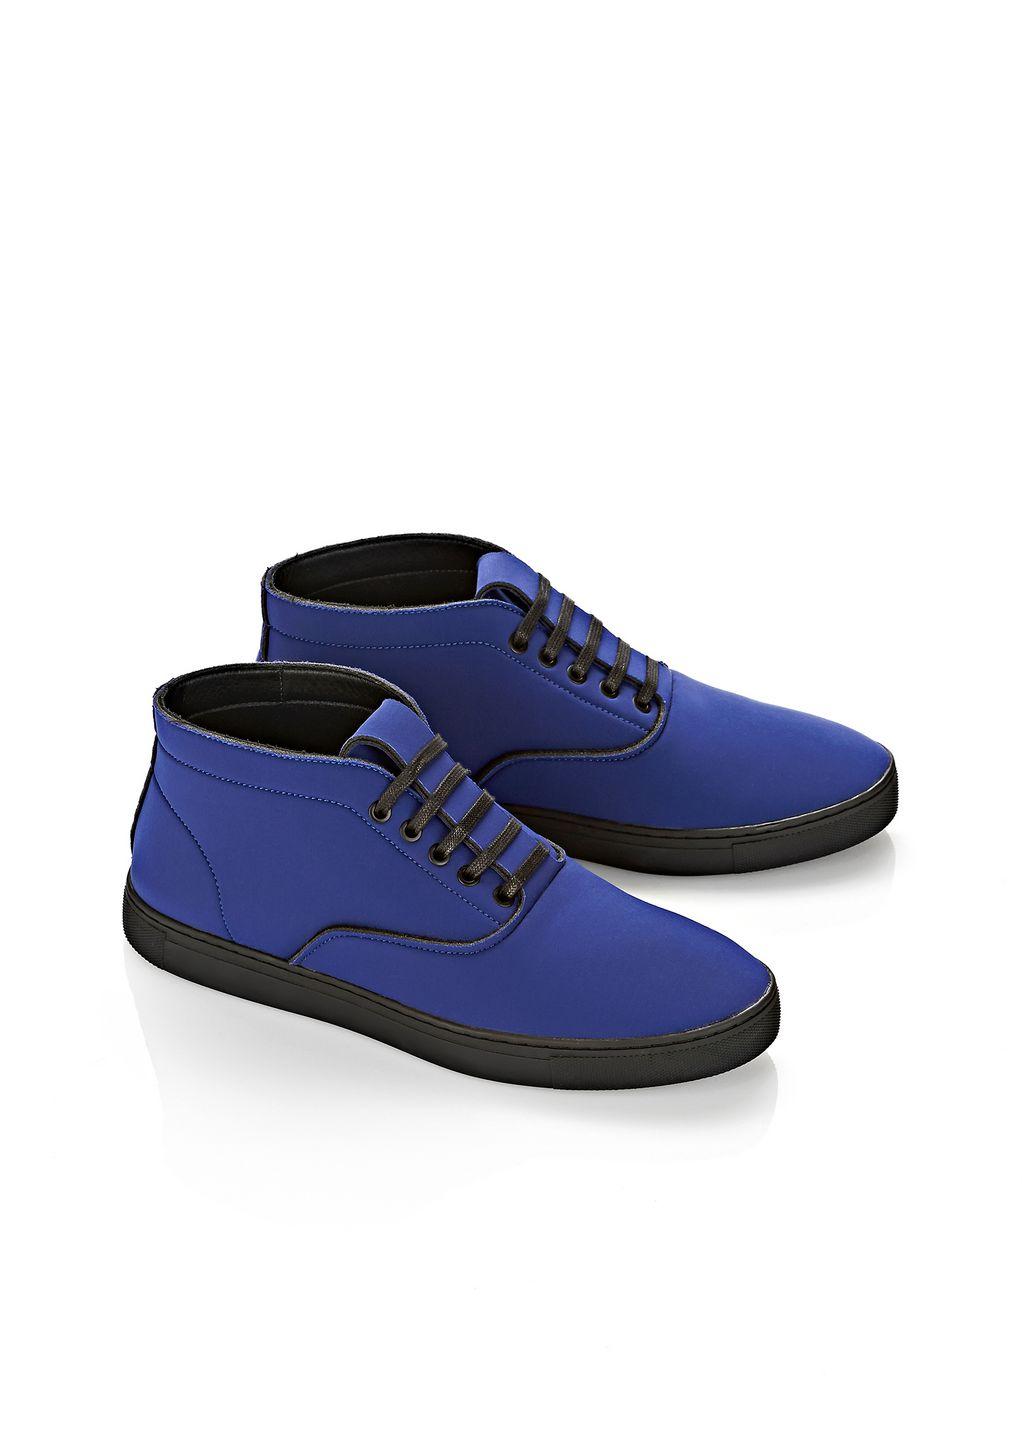 alexander wang ash high top neoprene sneaker in blue for men lyst. Black Bedroom Furniture Sets. Home Design Ideas